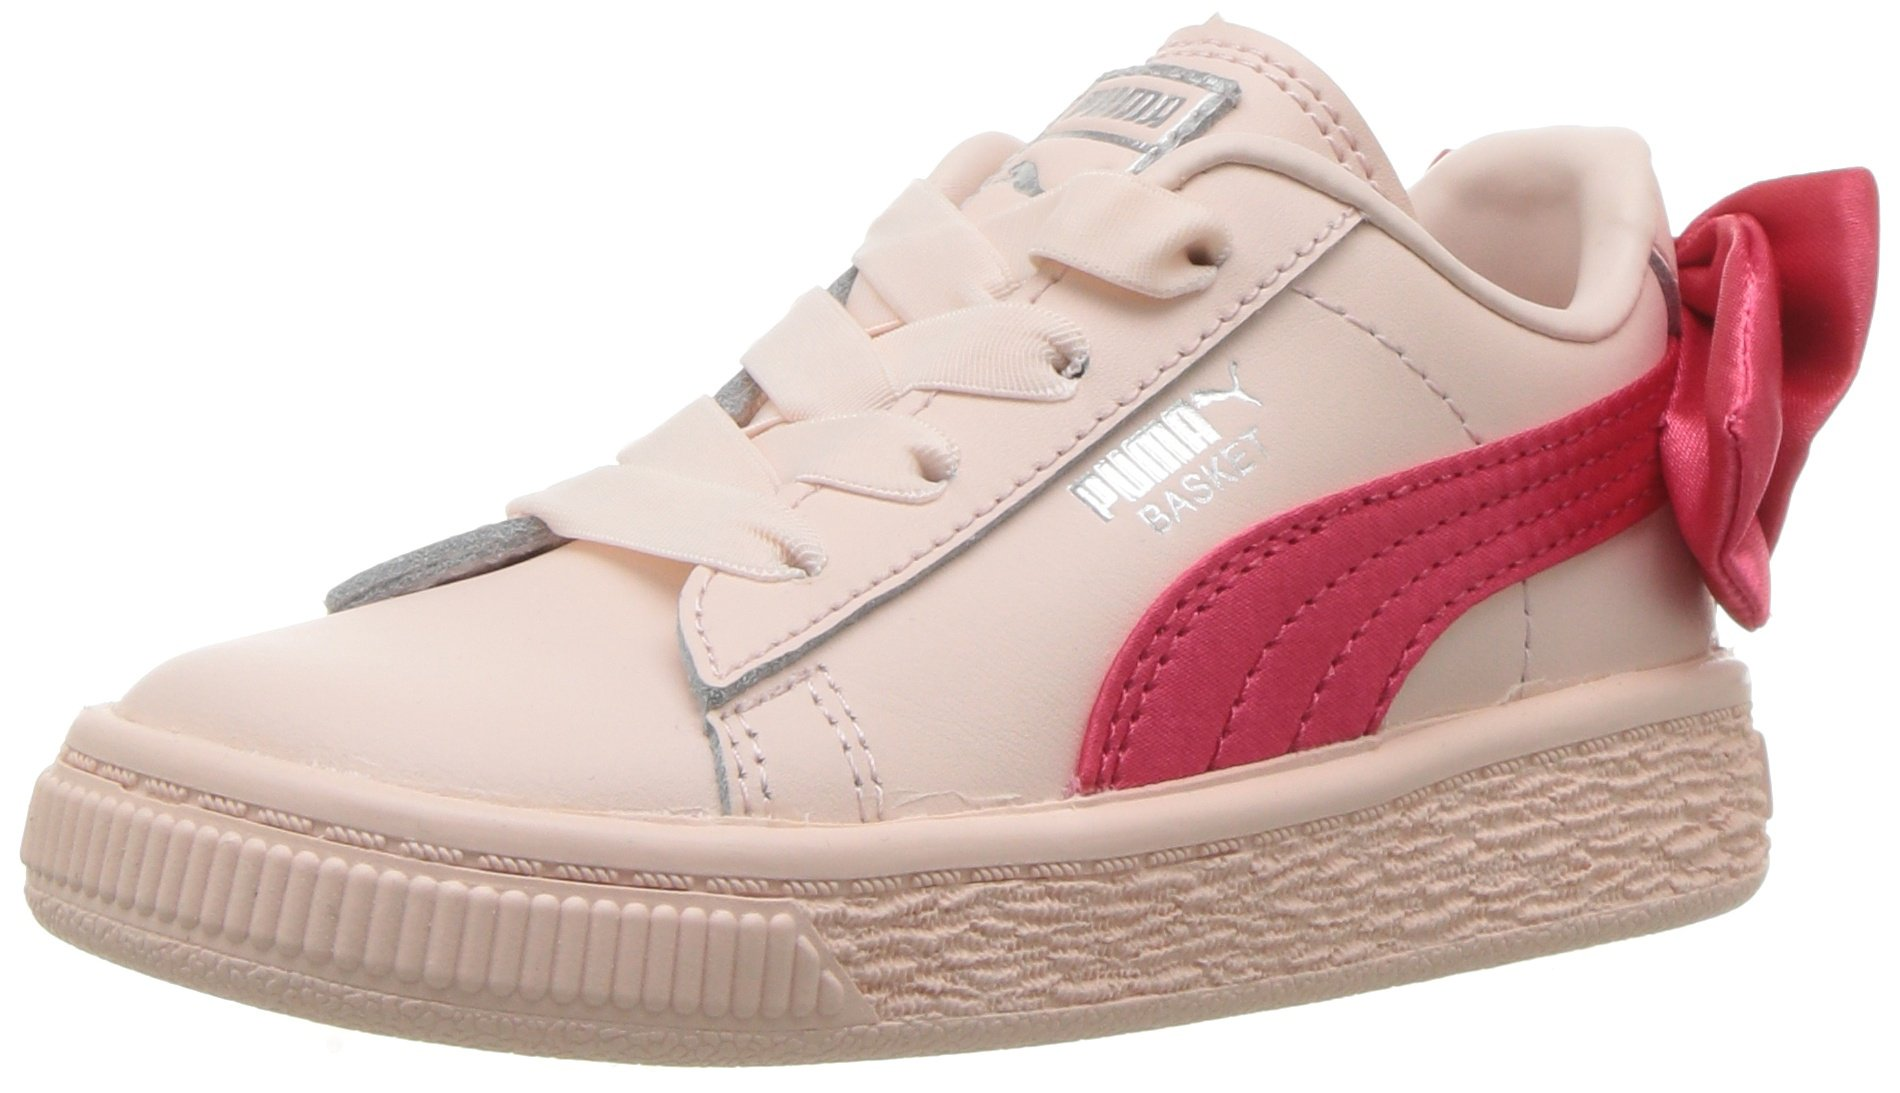 PUMA Baby Basket Bow Slip On Sneaker